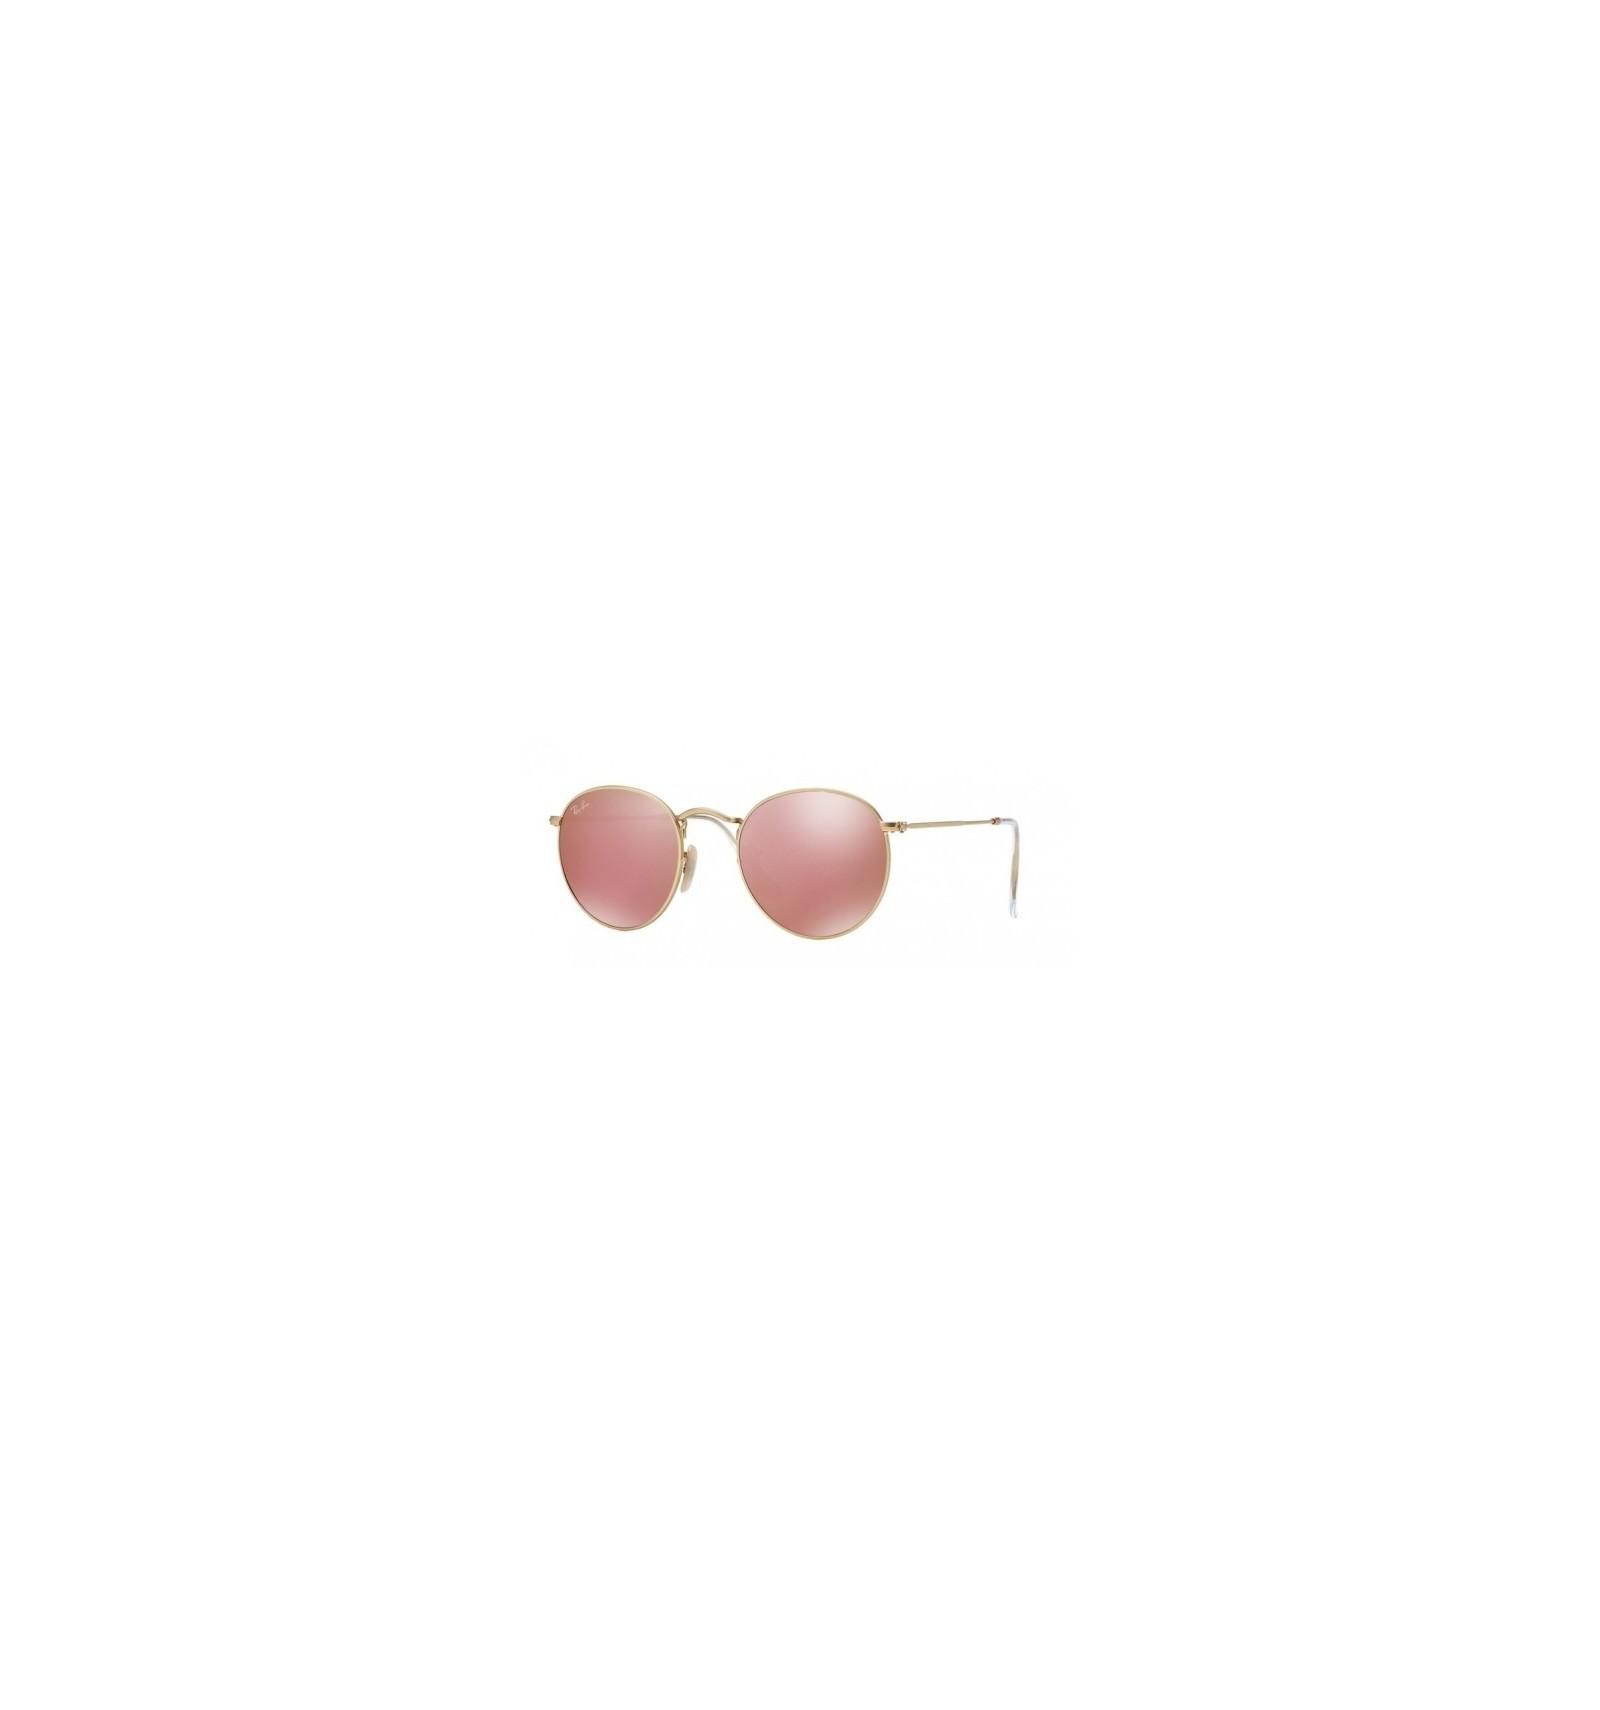 Gafas de sol RAY BAN 3447 ROUND METAL Matte Gold   Brown Mirror Pink 6dd895dbc1